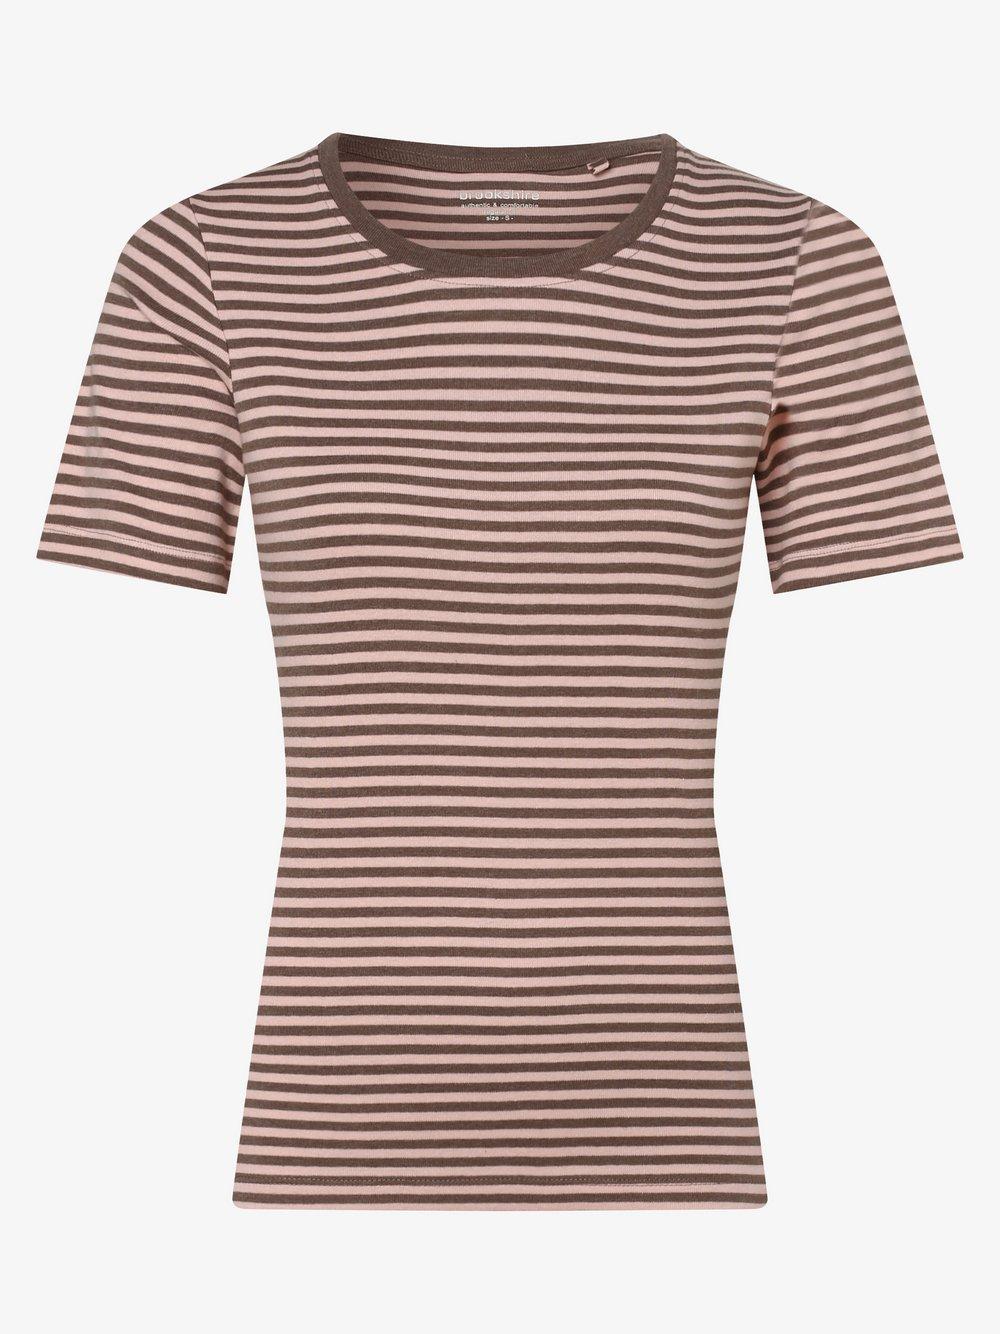 brookshire - T-shirt damski, beżowy